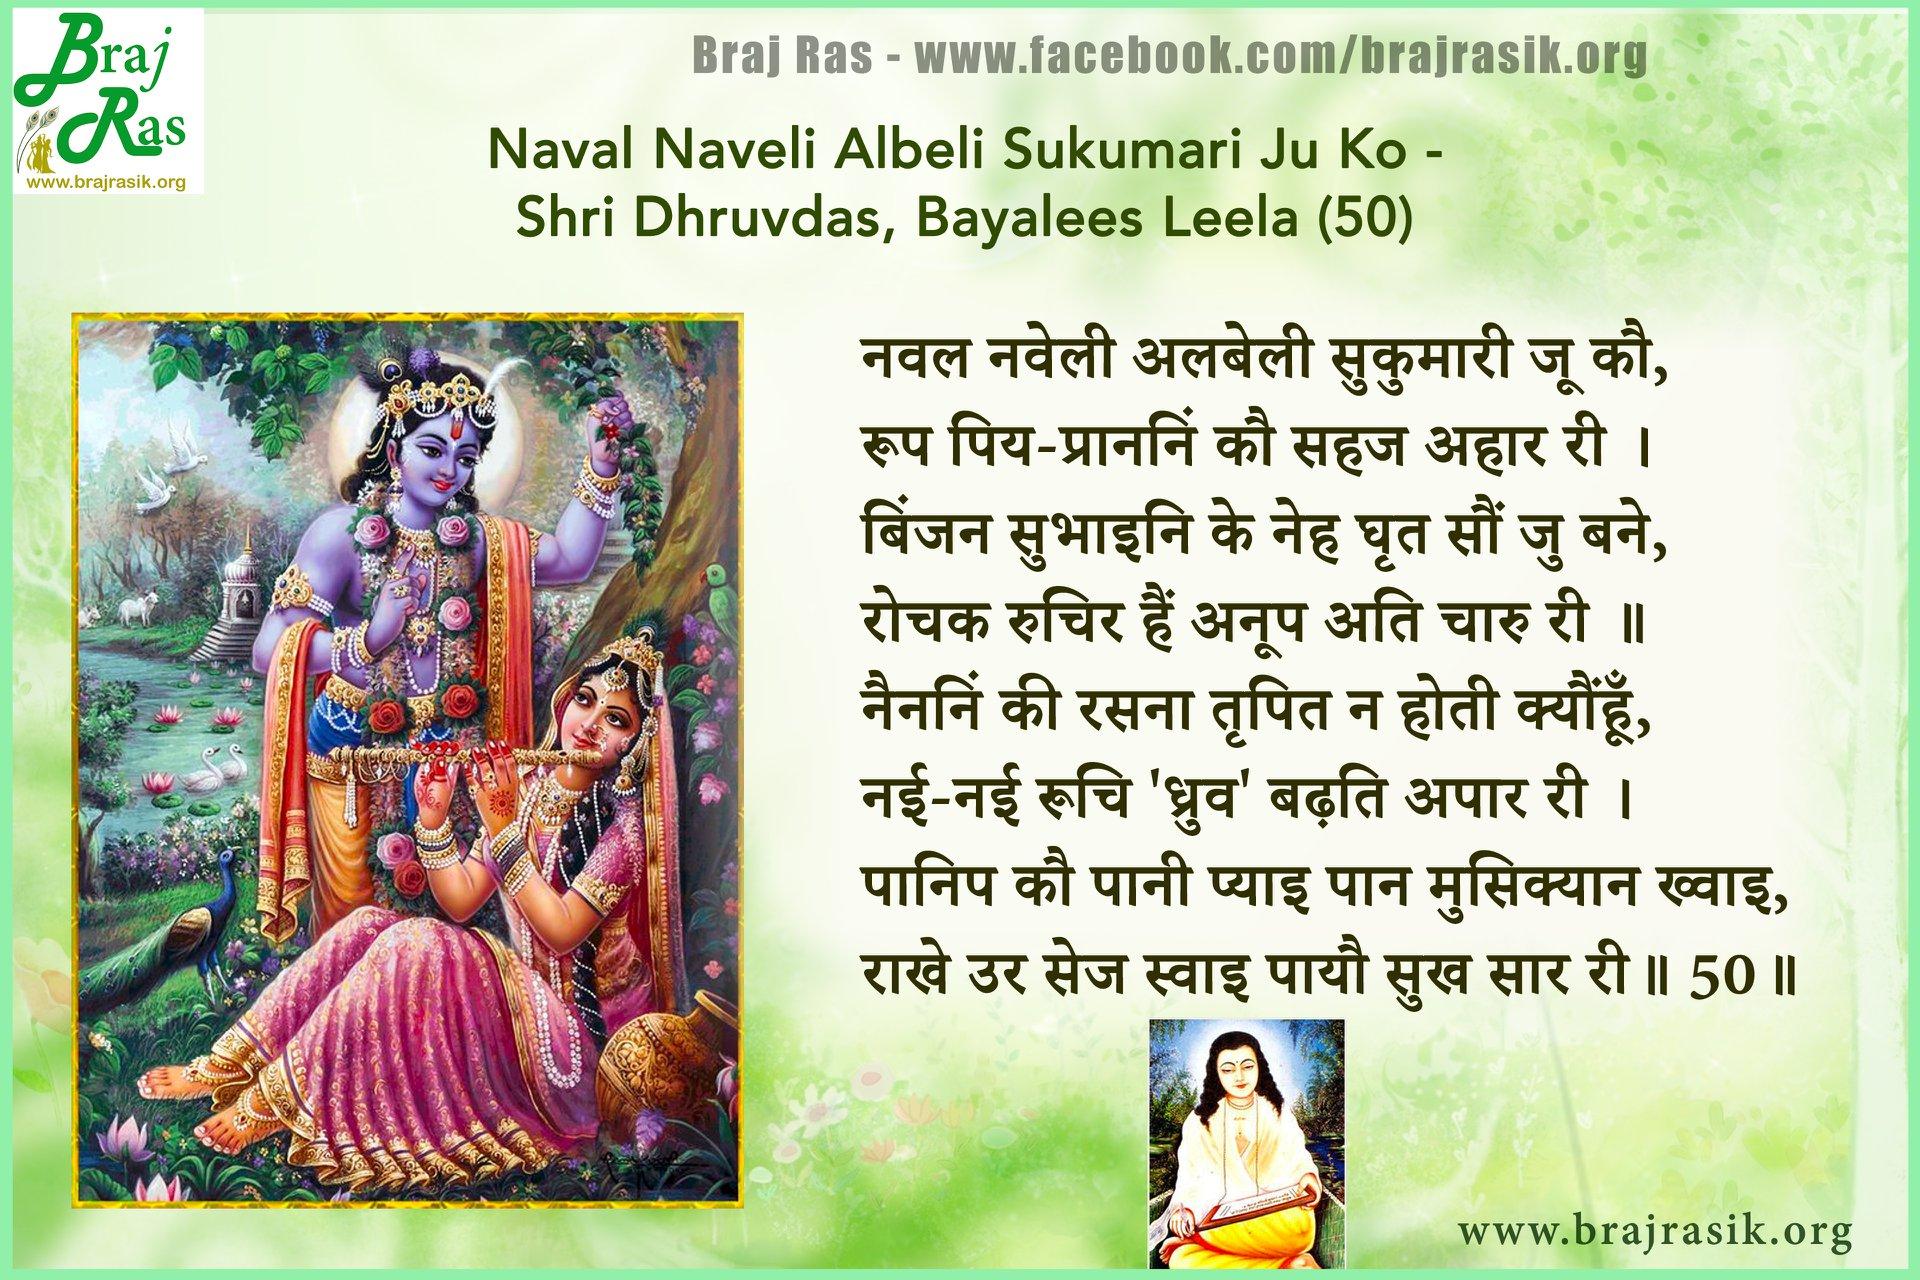 Naval Naveli Albeli Sukumari Ju Ko from Bayalees Leela (50) by Shri Dhruvdas